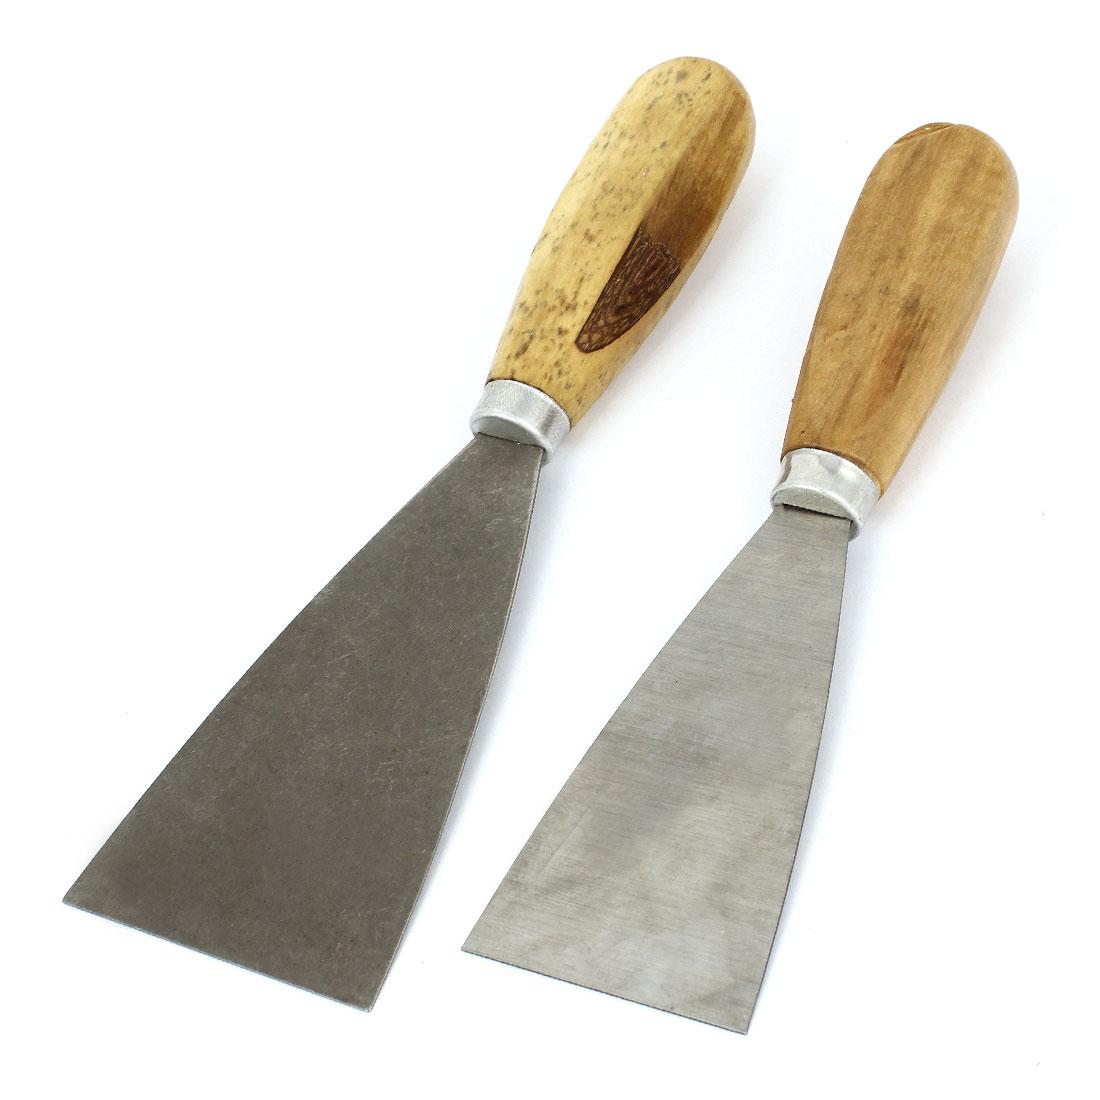 "2pcs 2"" 2.5"" Width Metal Blade Wooden Handle Drywall Repair Putty Scraper"